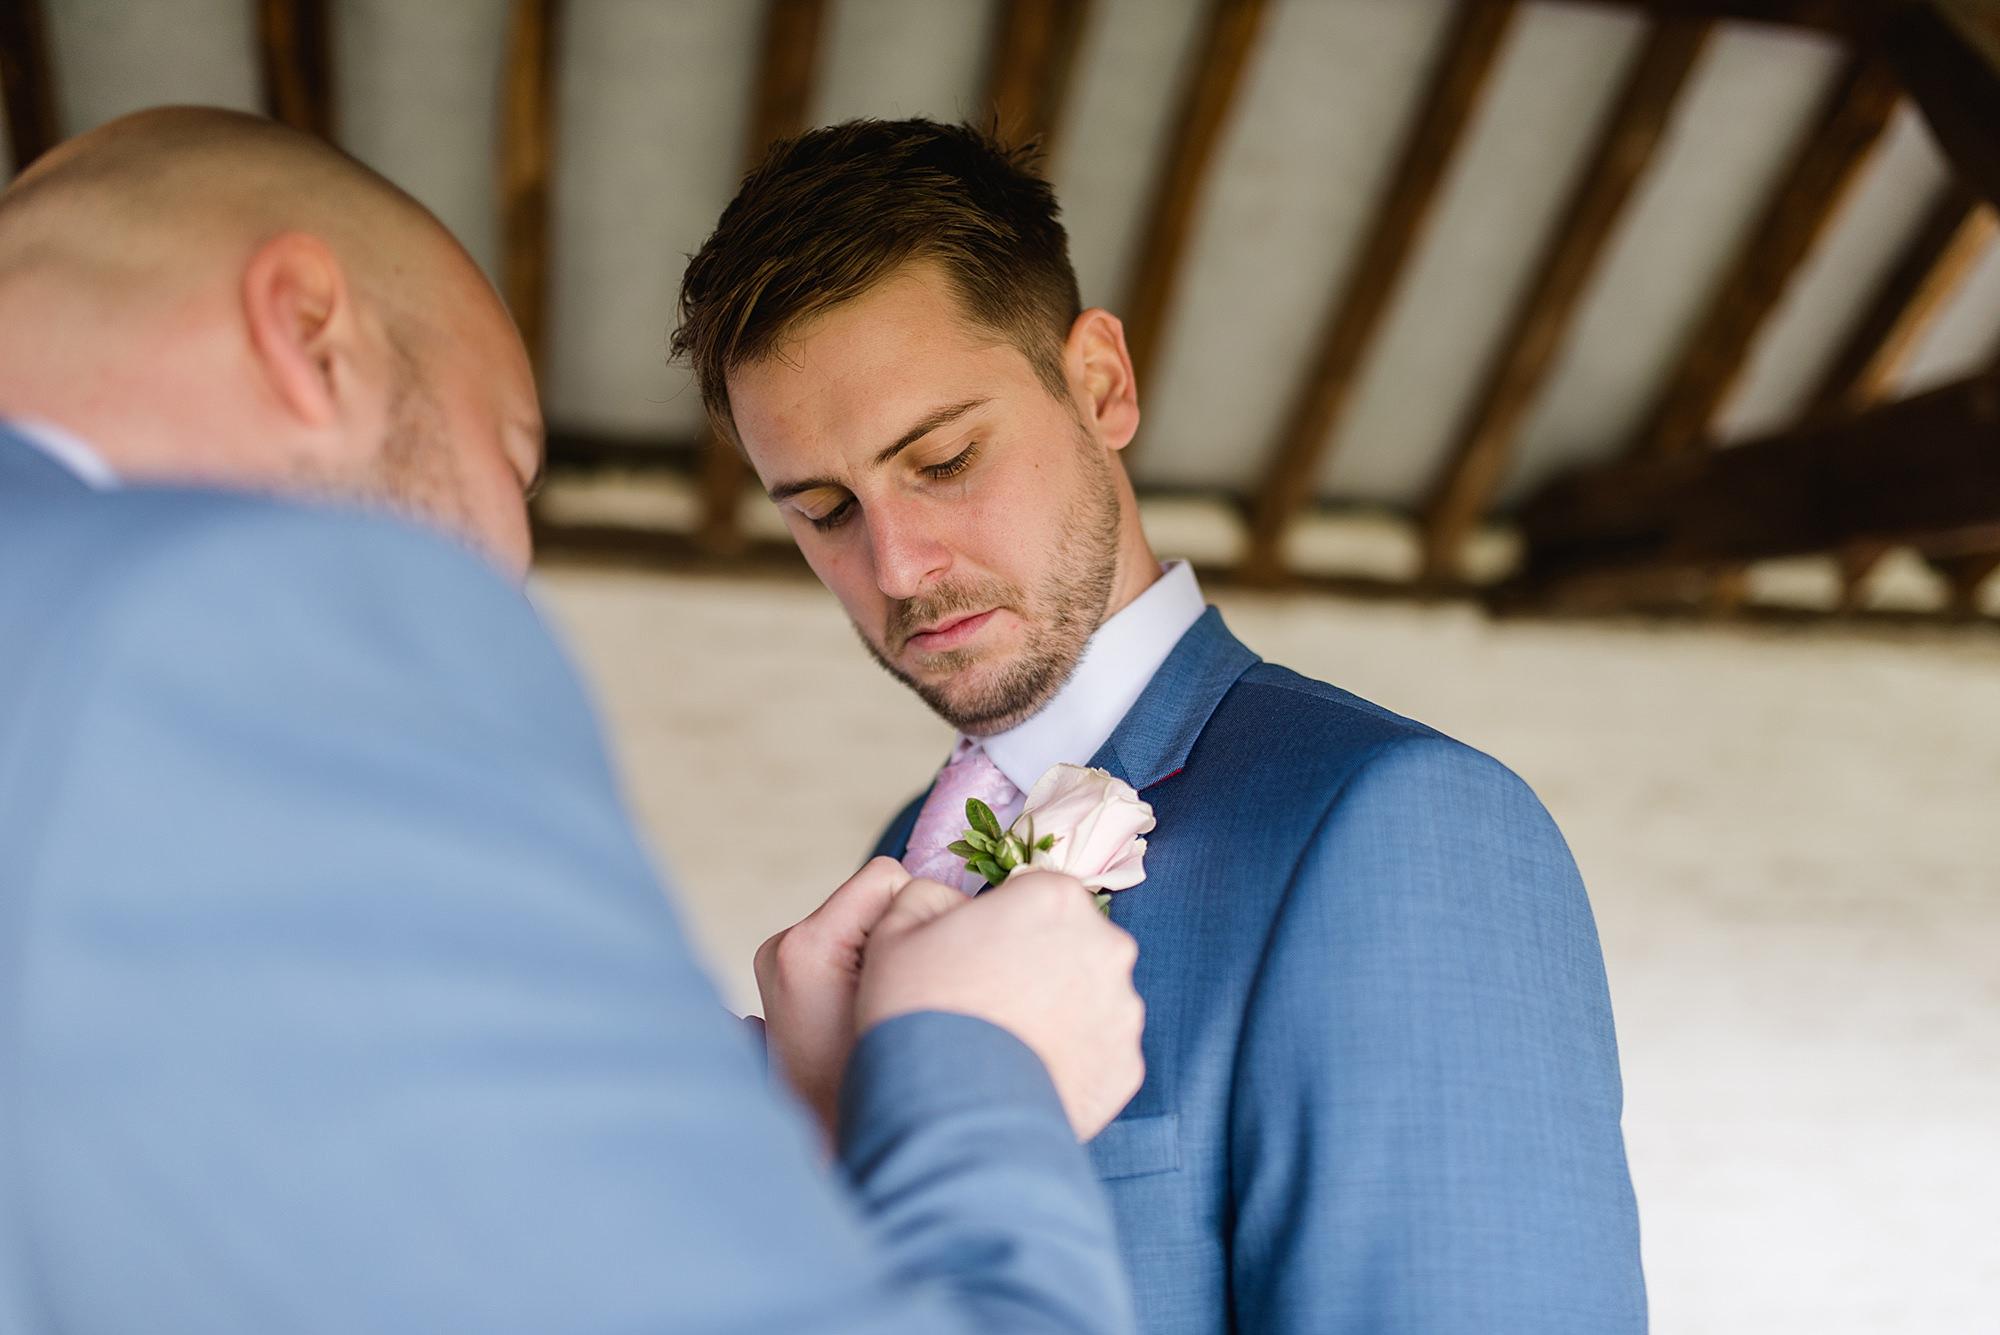 Lillibrooke Manor wedding best man puts buttonhole on groom